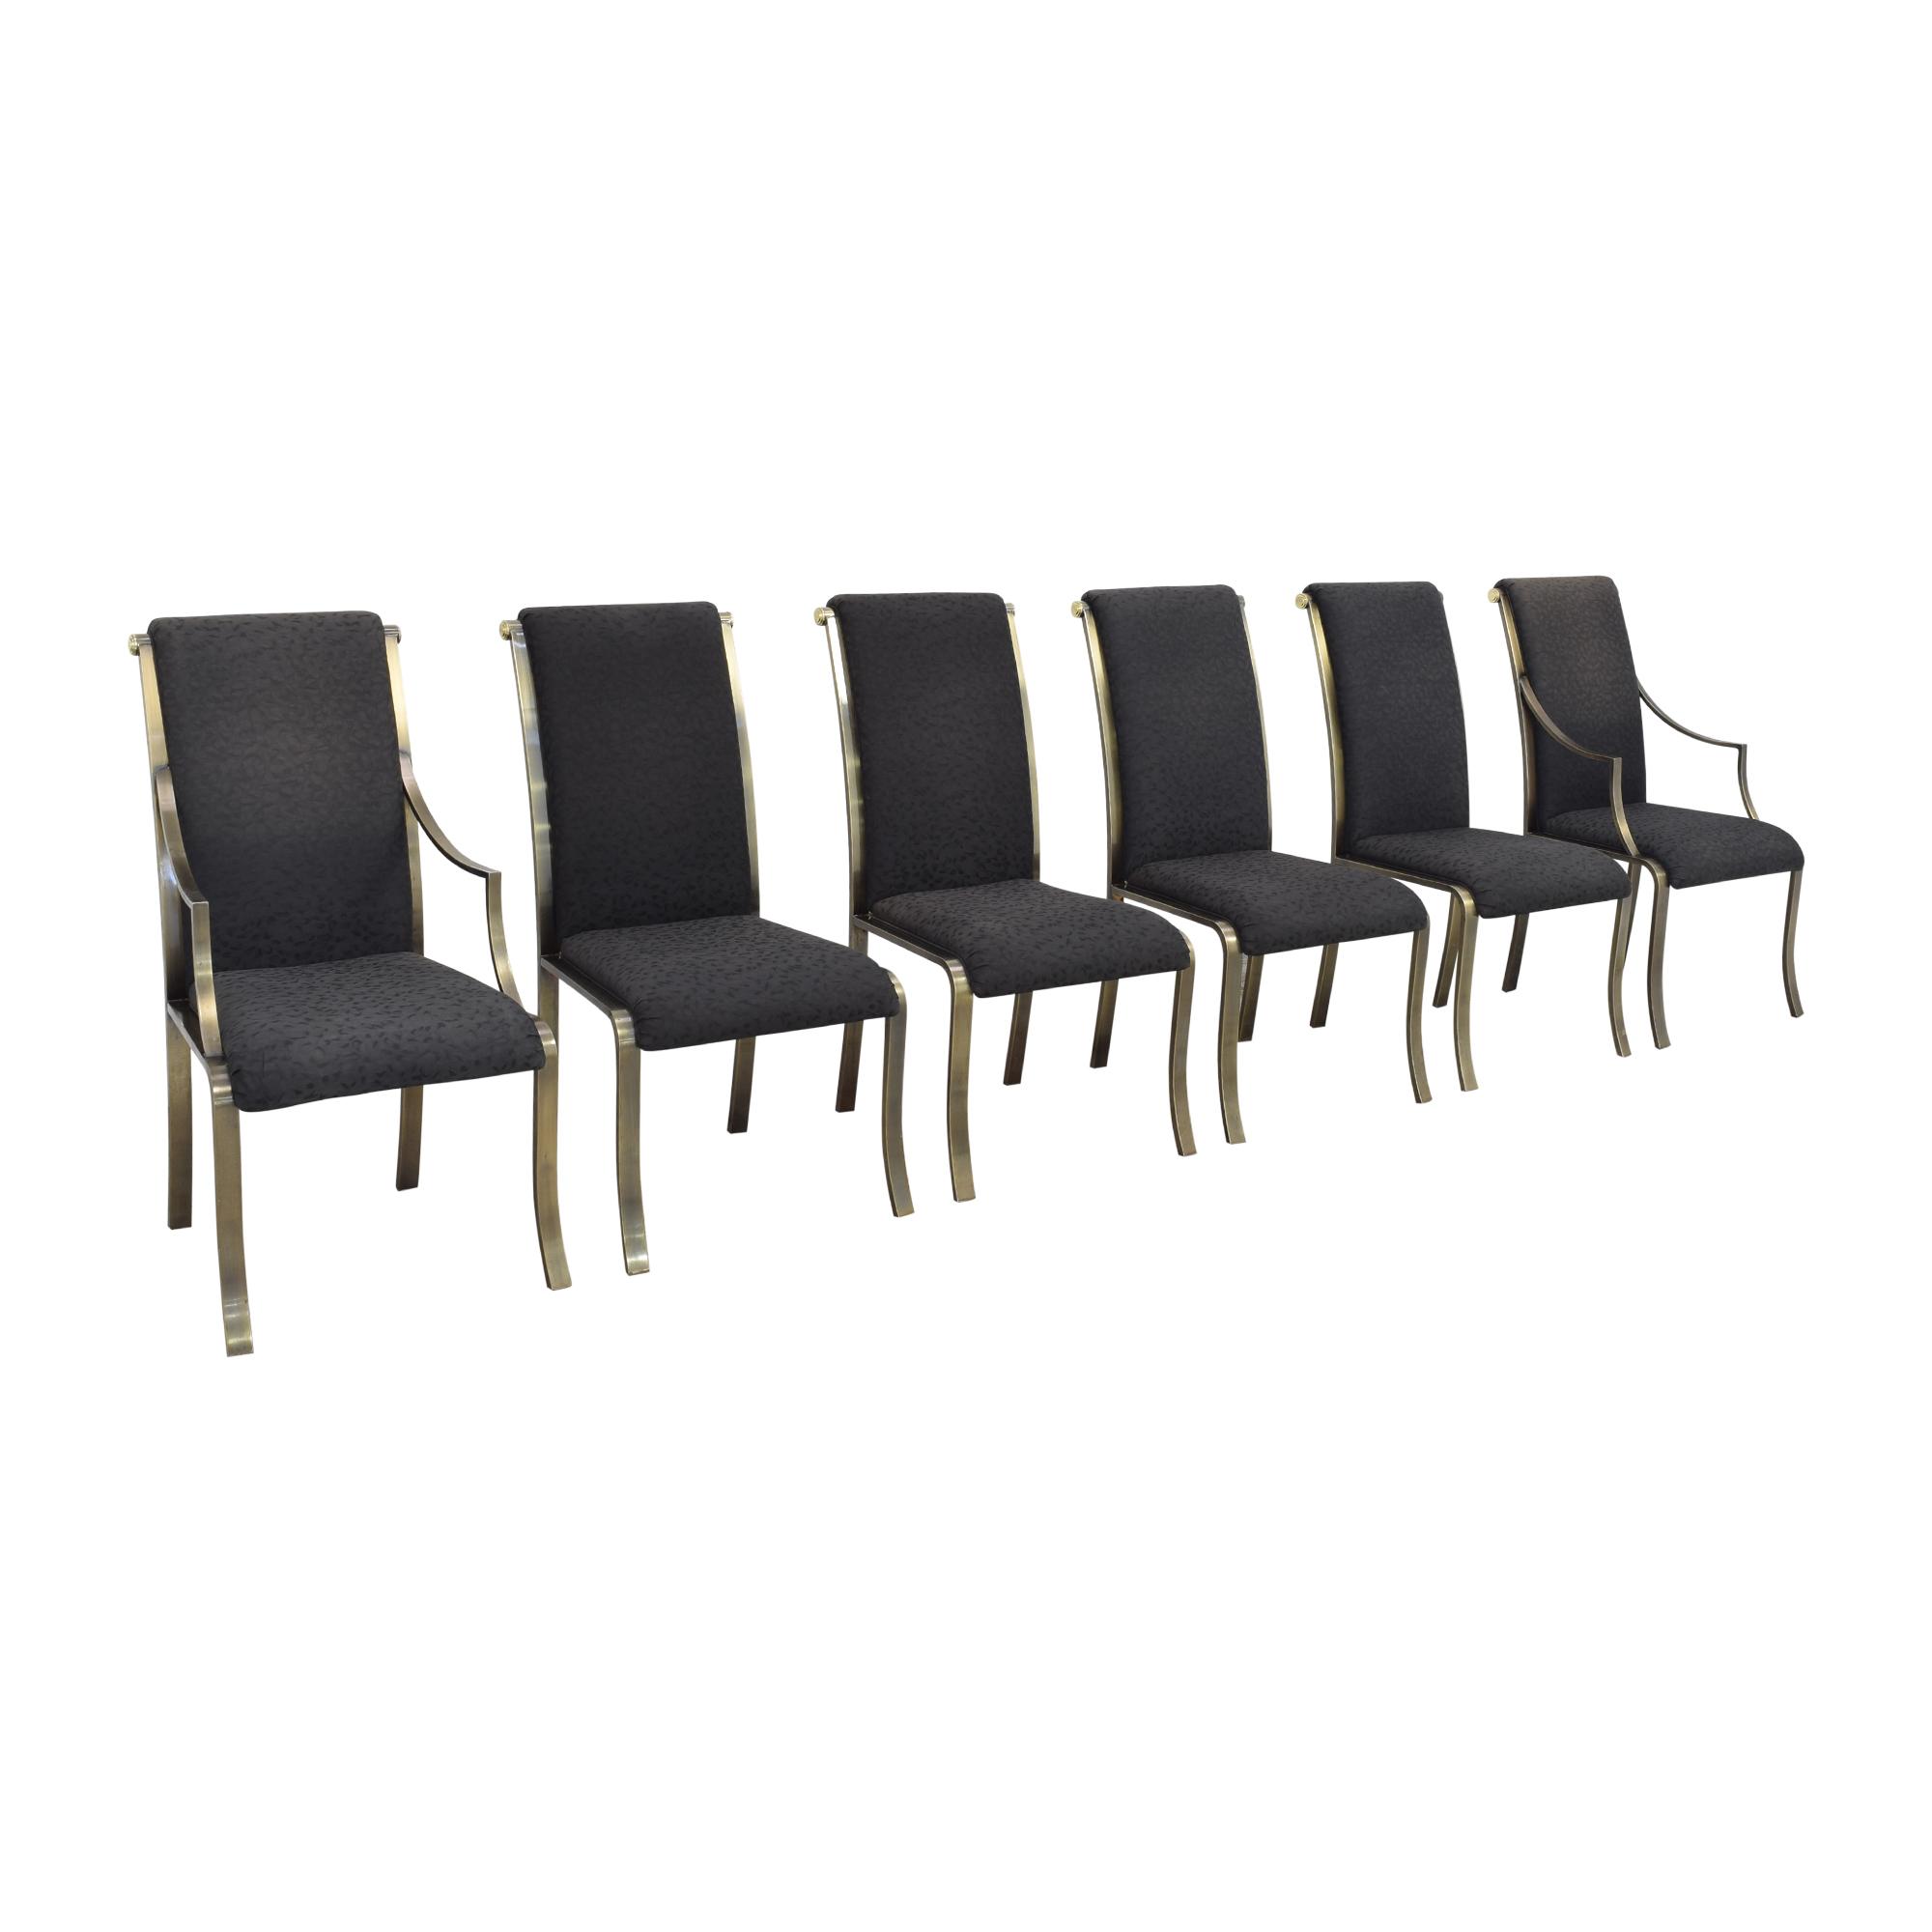 buy Design Institute America High Back Dining Chairs Design Institute America Chairs